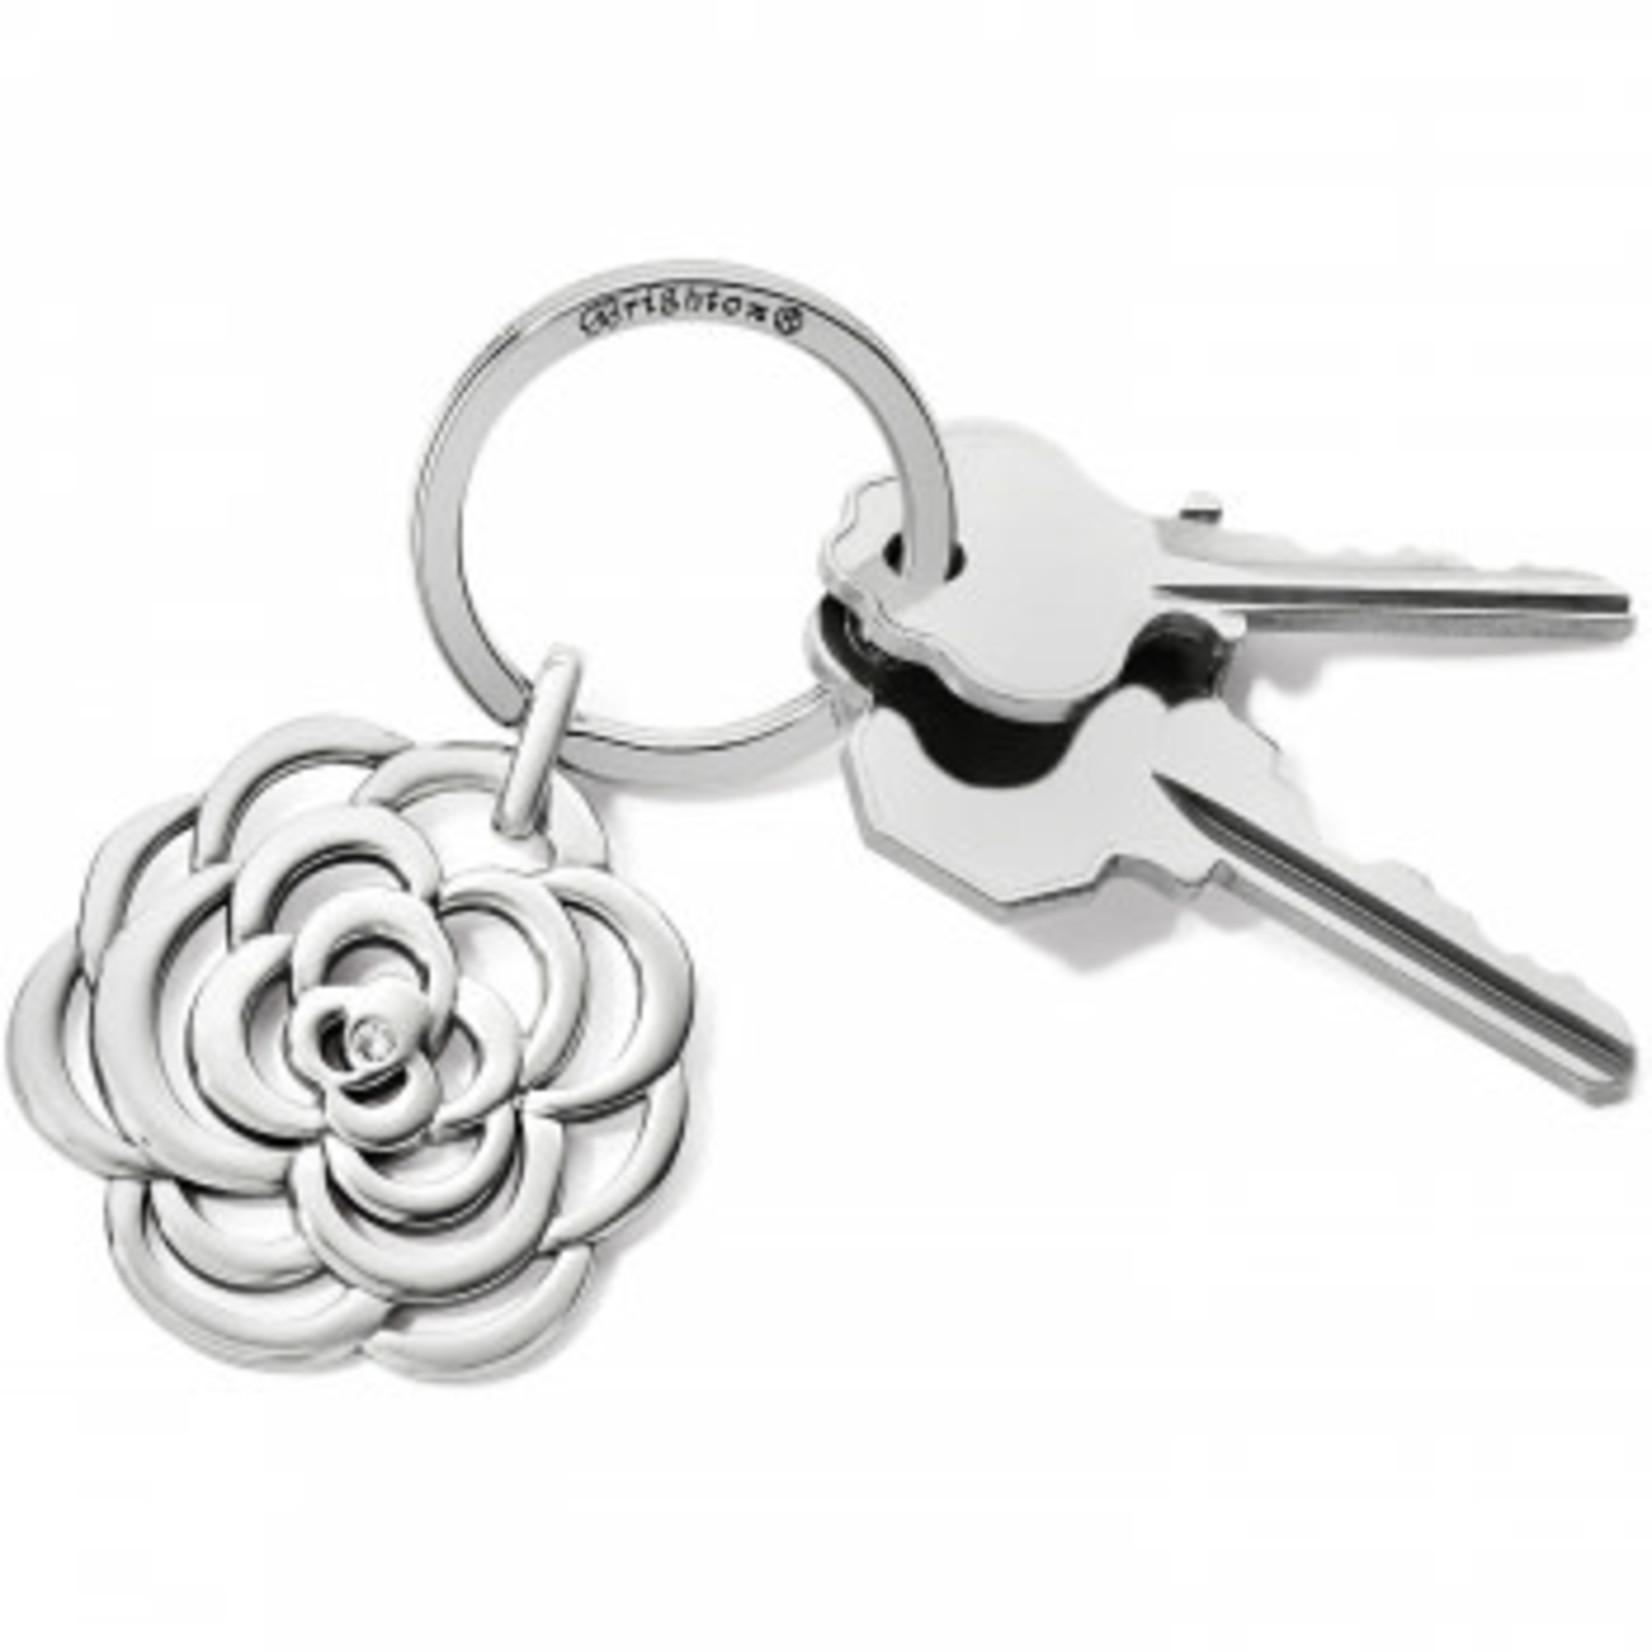 Brighton The Botanical Key Fob Silver